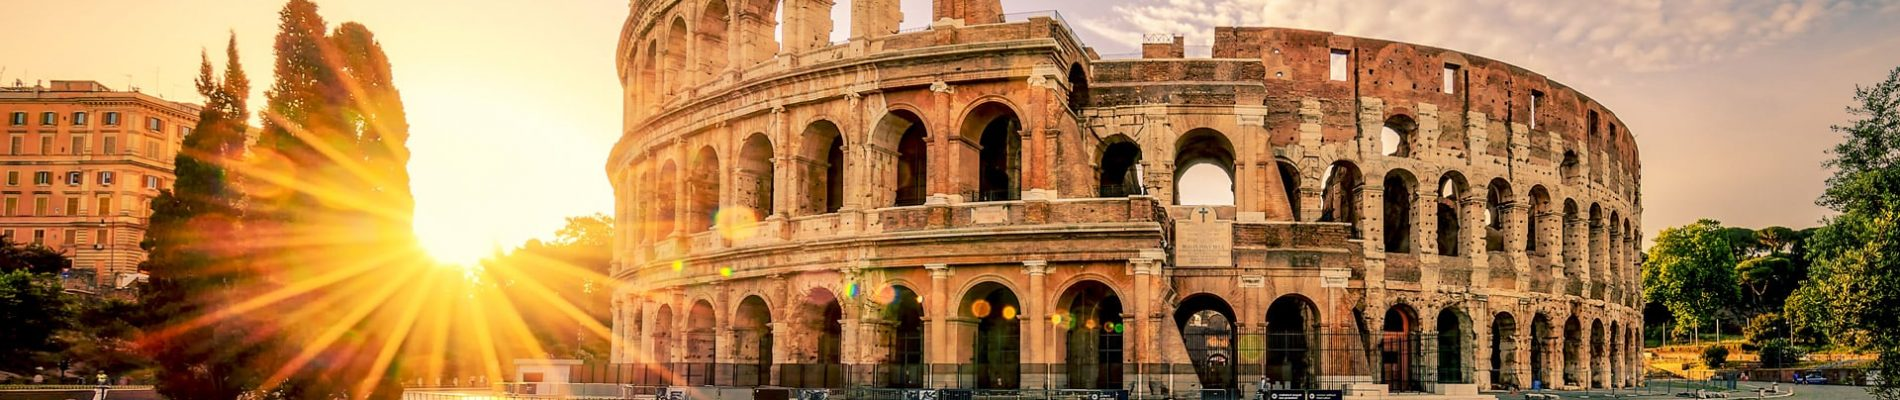 Cired2023 Roma